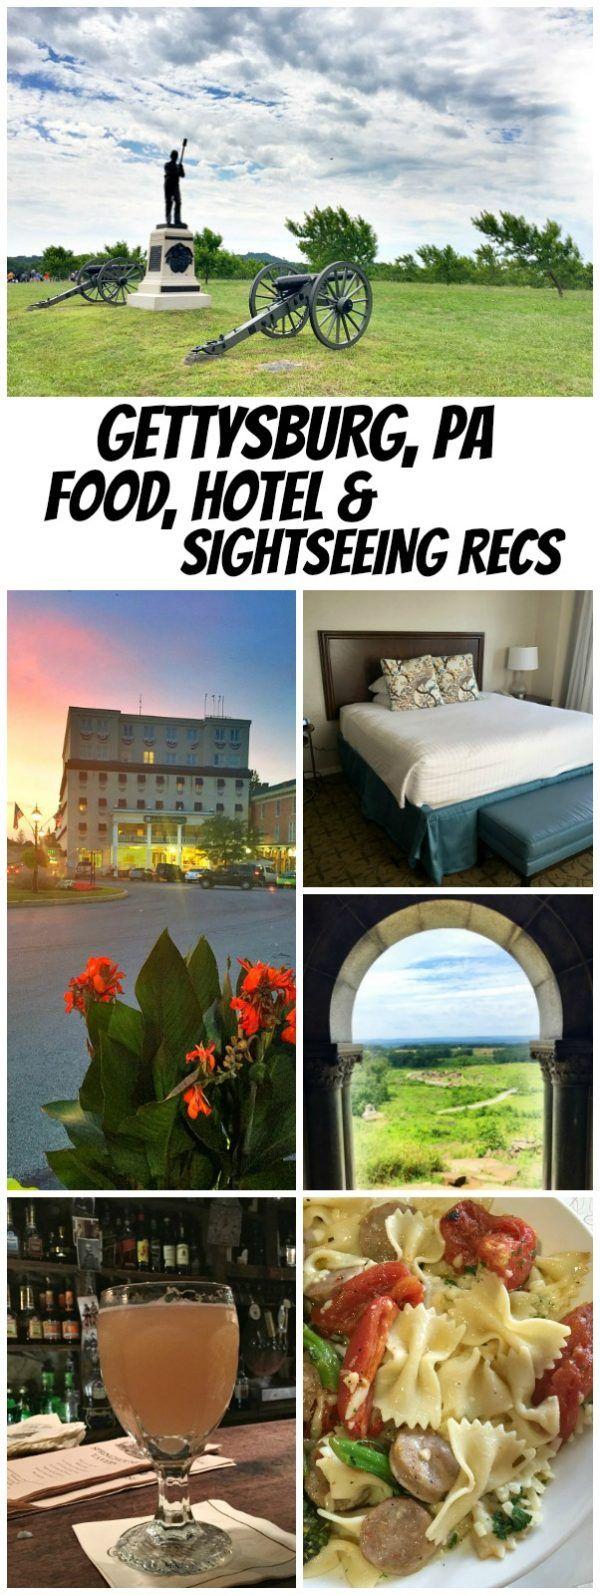 Gettysburg Hotel Review: + Gettysburg Restaurant Reviews and a peek at the Gettysburg Battlefield.  Gettysburg, Pennsylvania